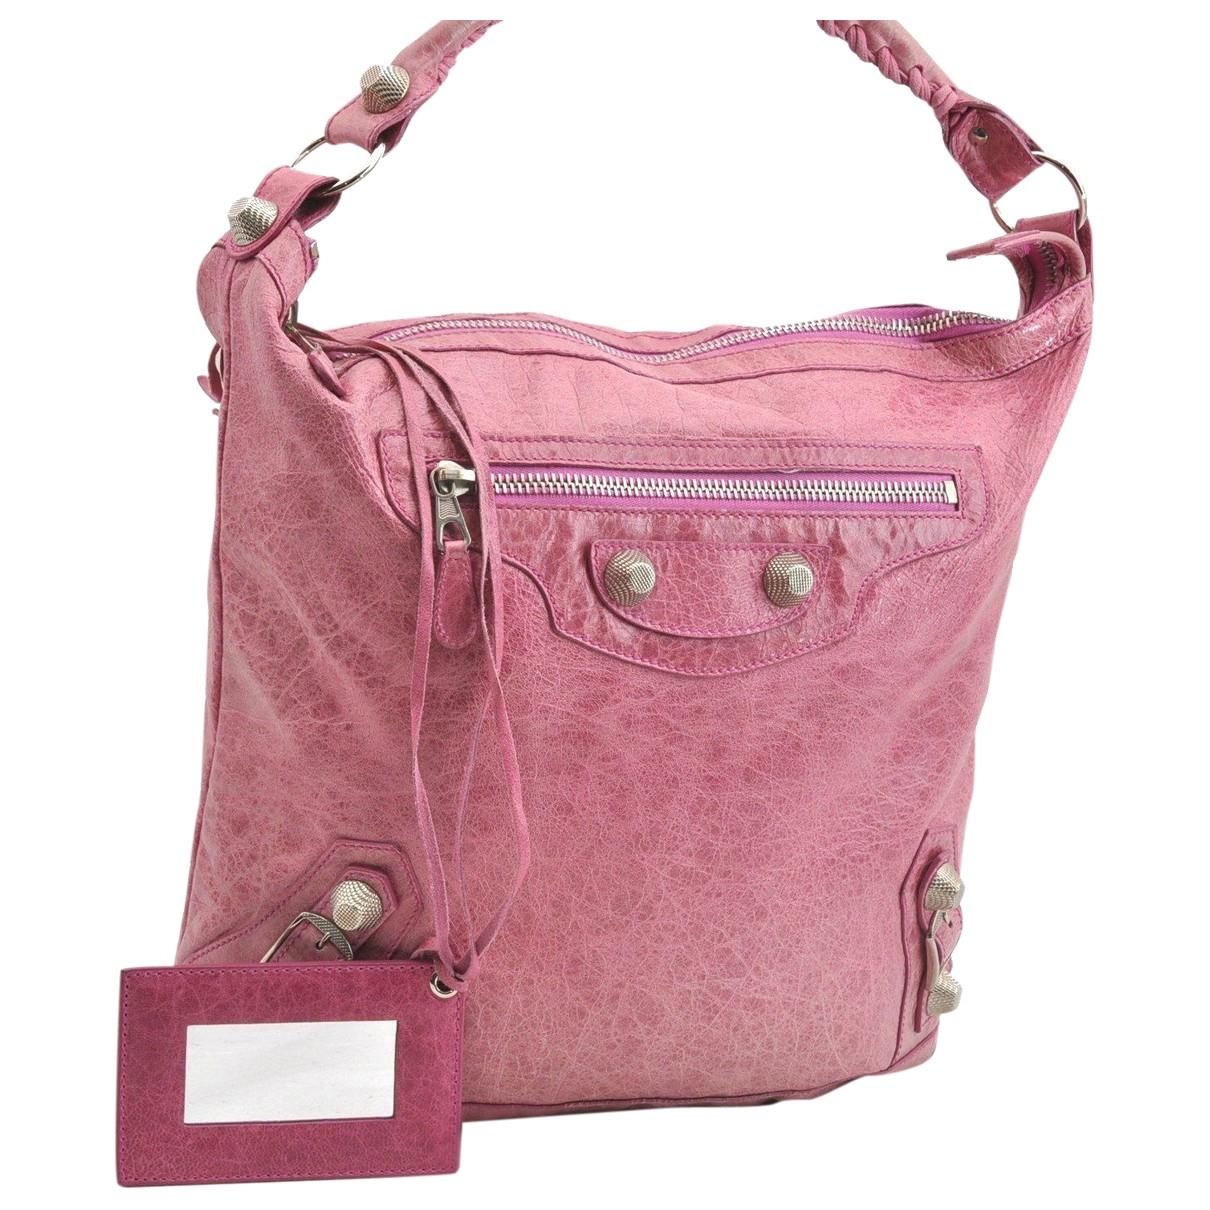 Balenciaga N Pink Leather handbag for Women N